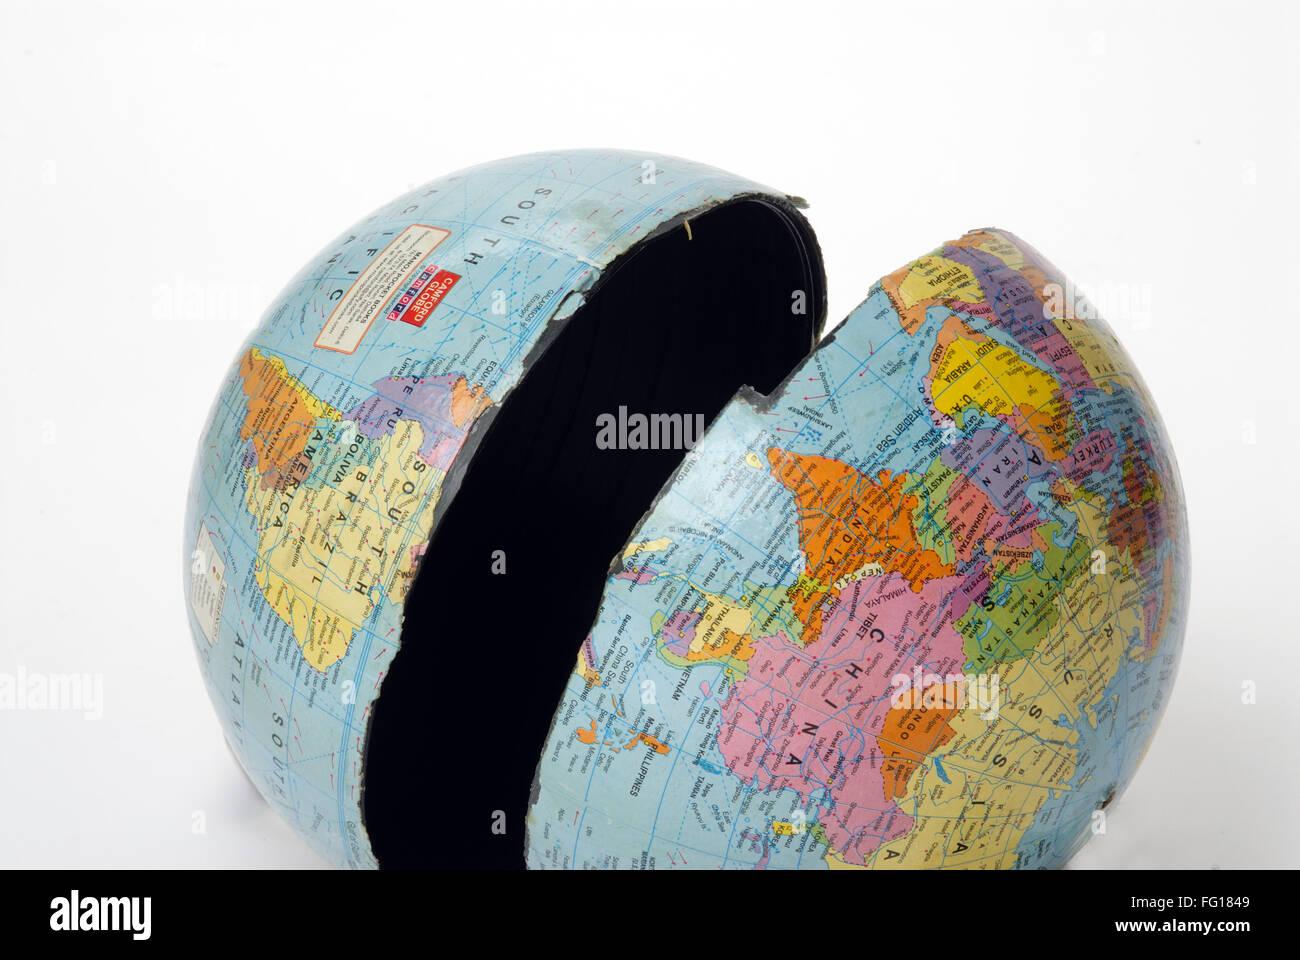 Globe world map broken world due to global warming - Stock Image